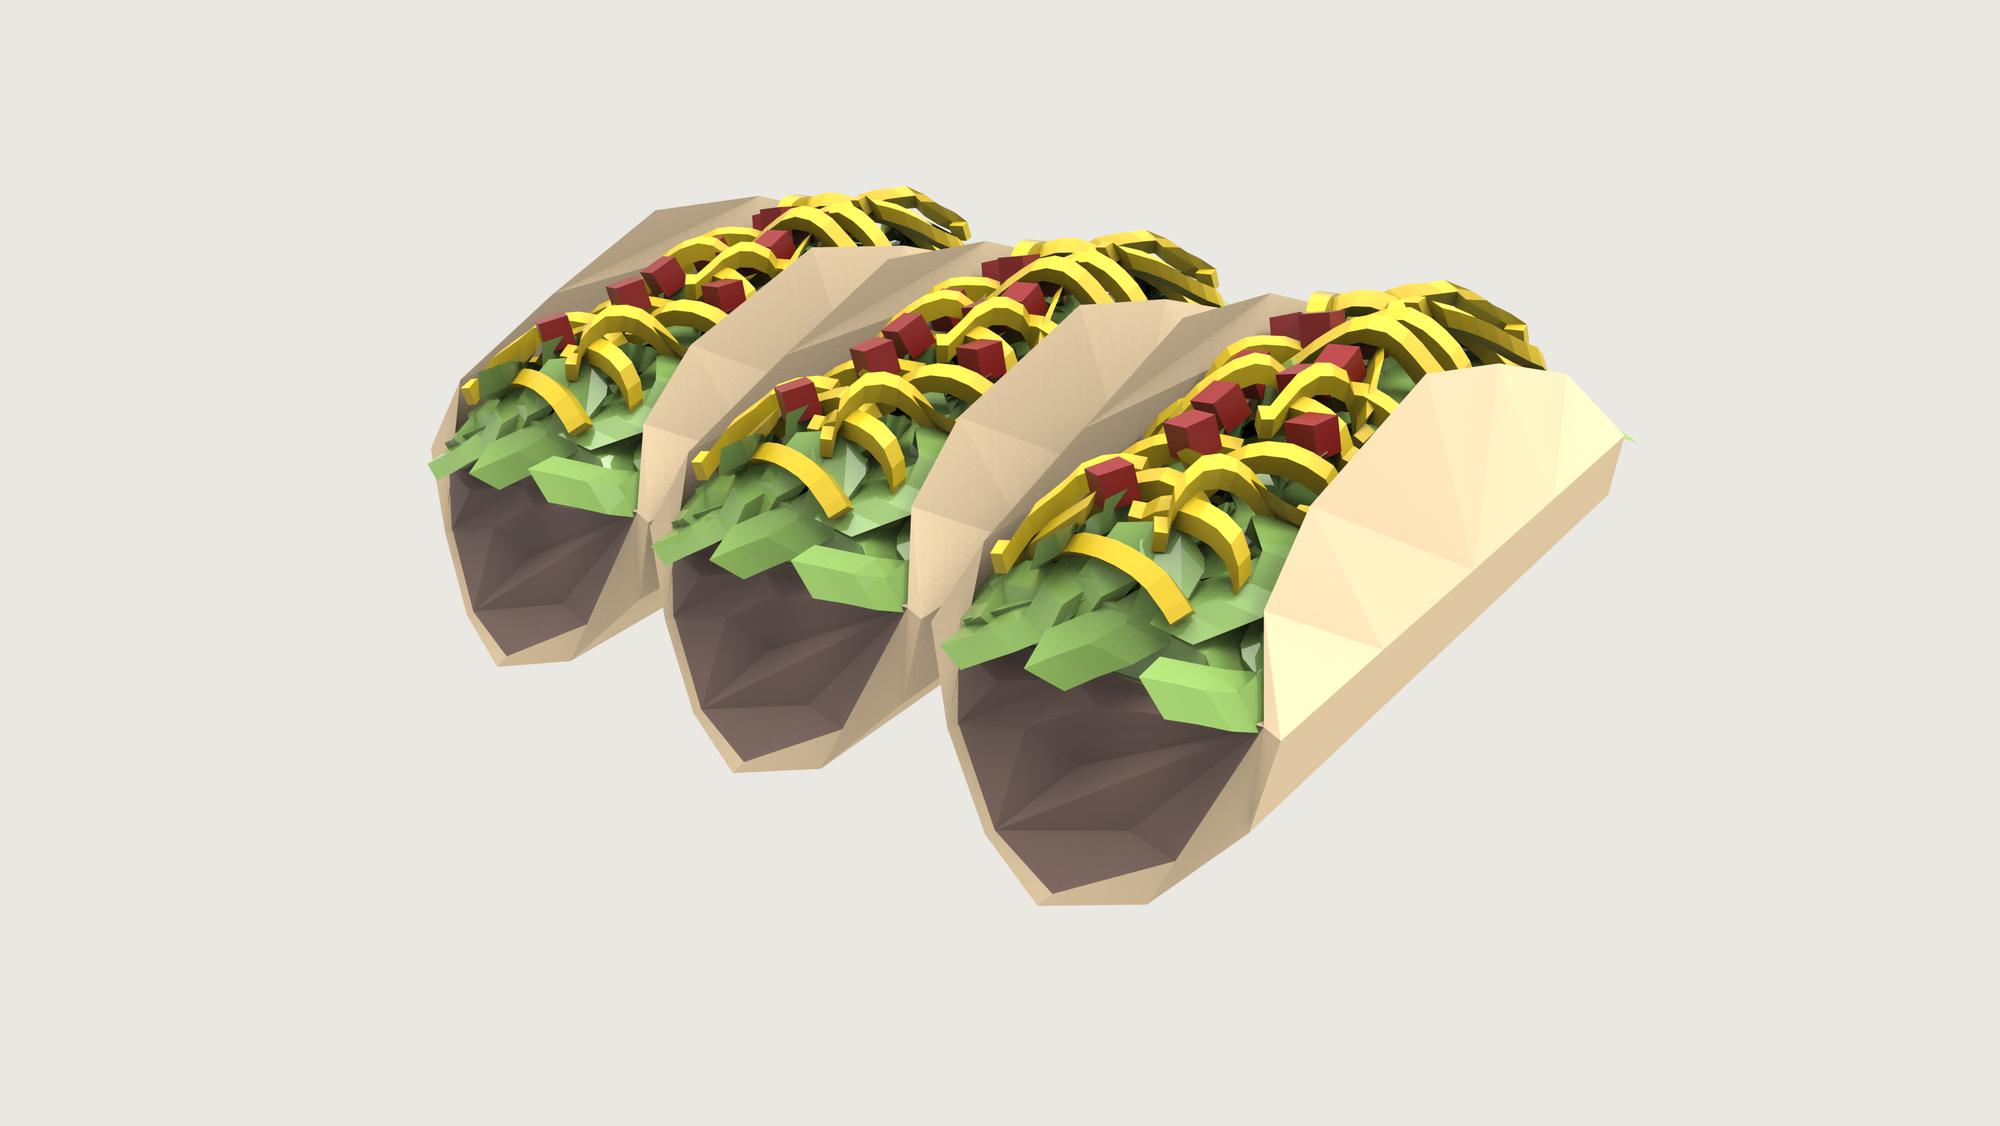 TacosBlocks